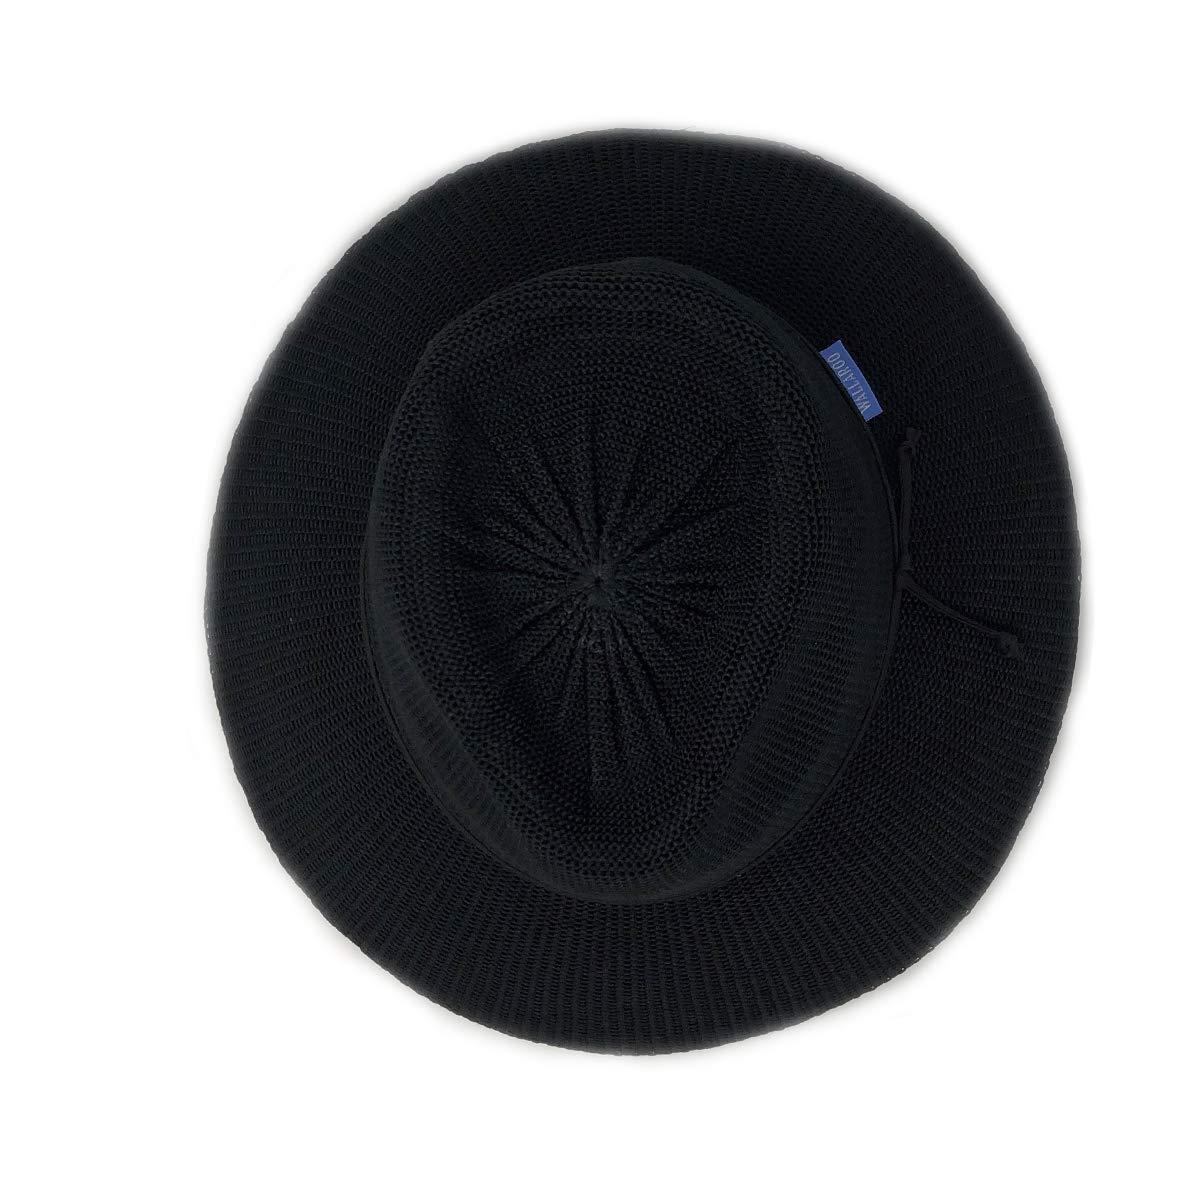 74d2668a Wallaroo Hat Company Women's Victoria Fedora Sun Hat - Black - UPF 50+ at  Amazon Women's Clothing store: